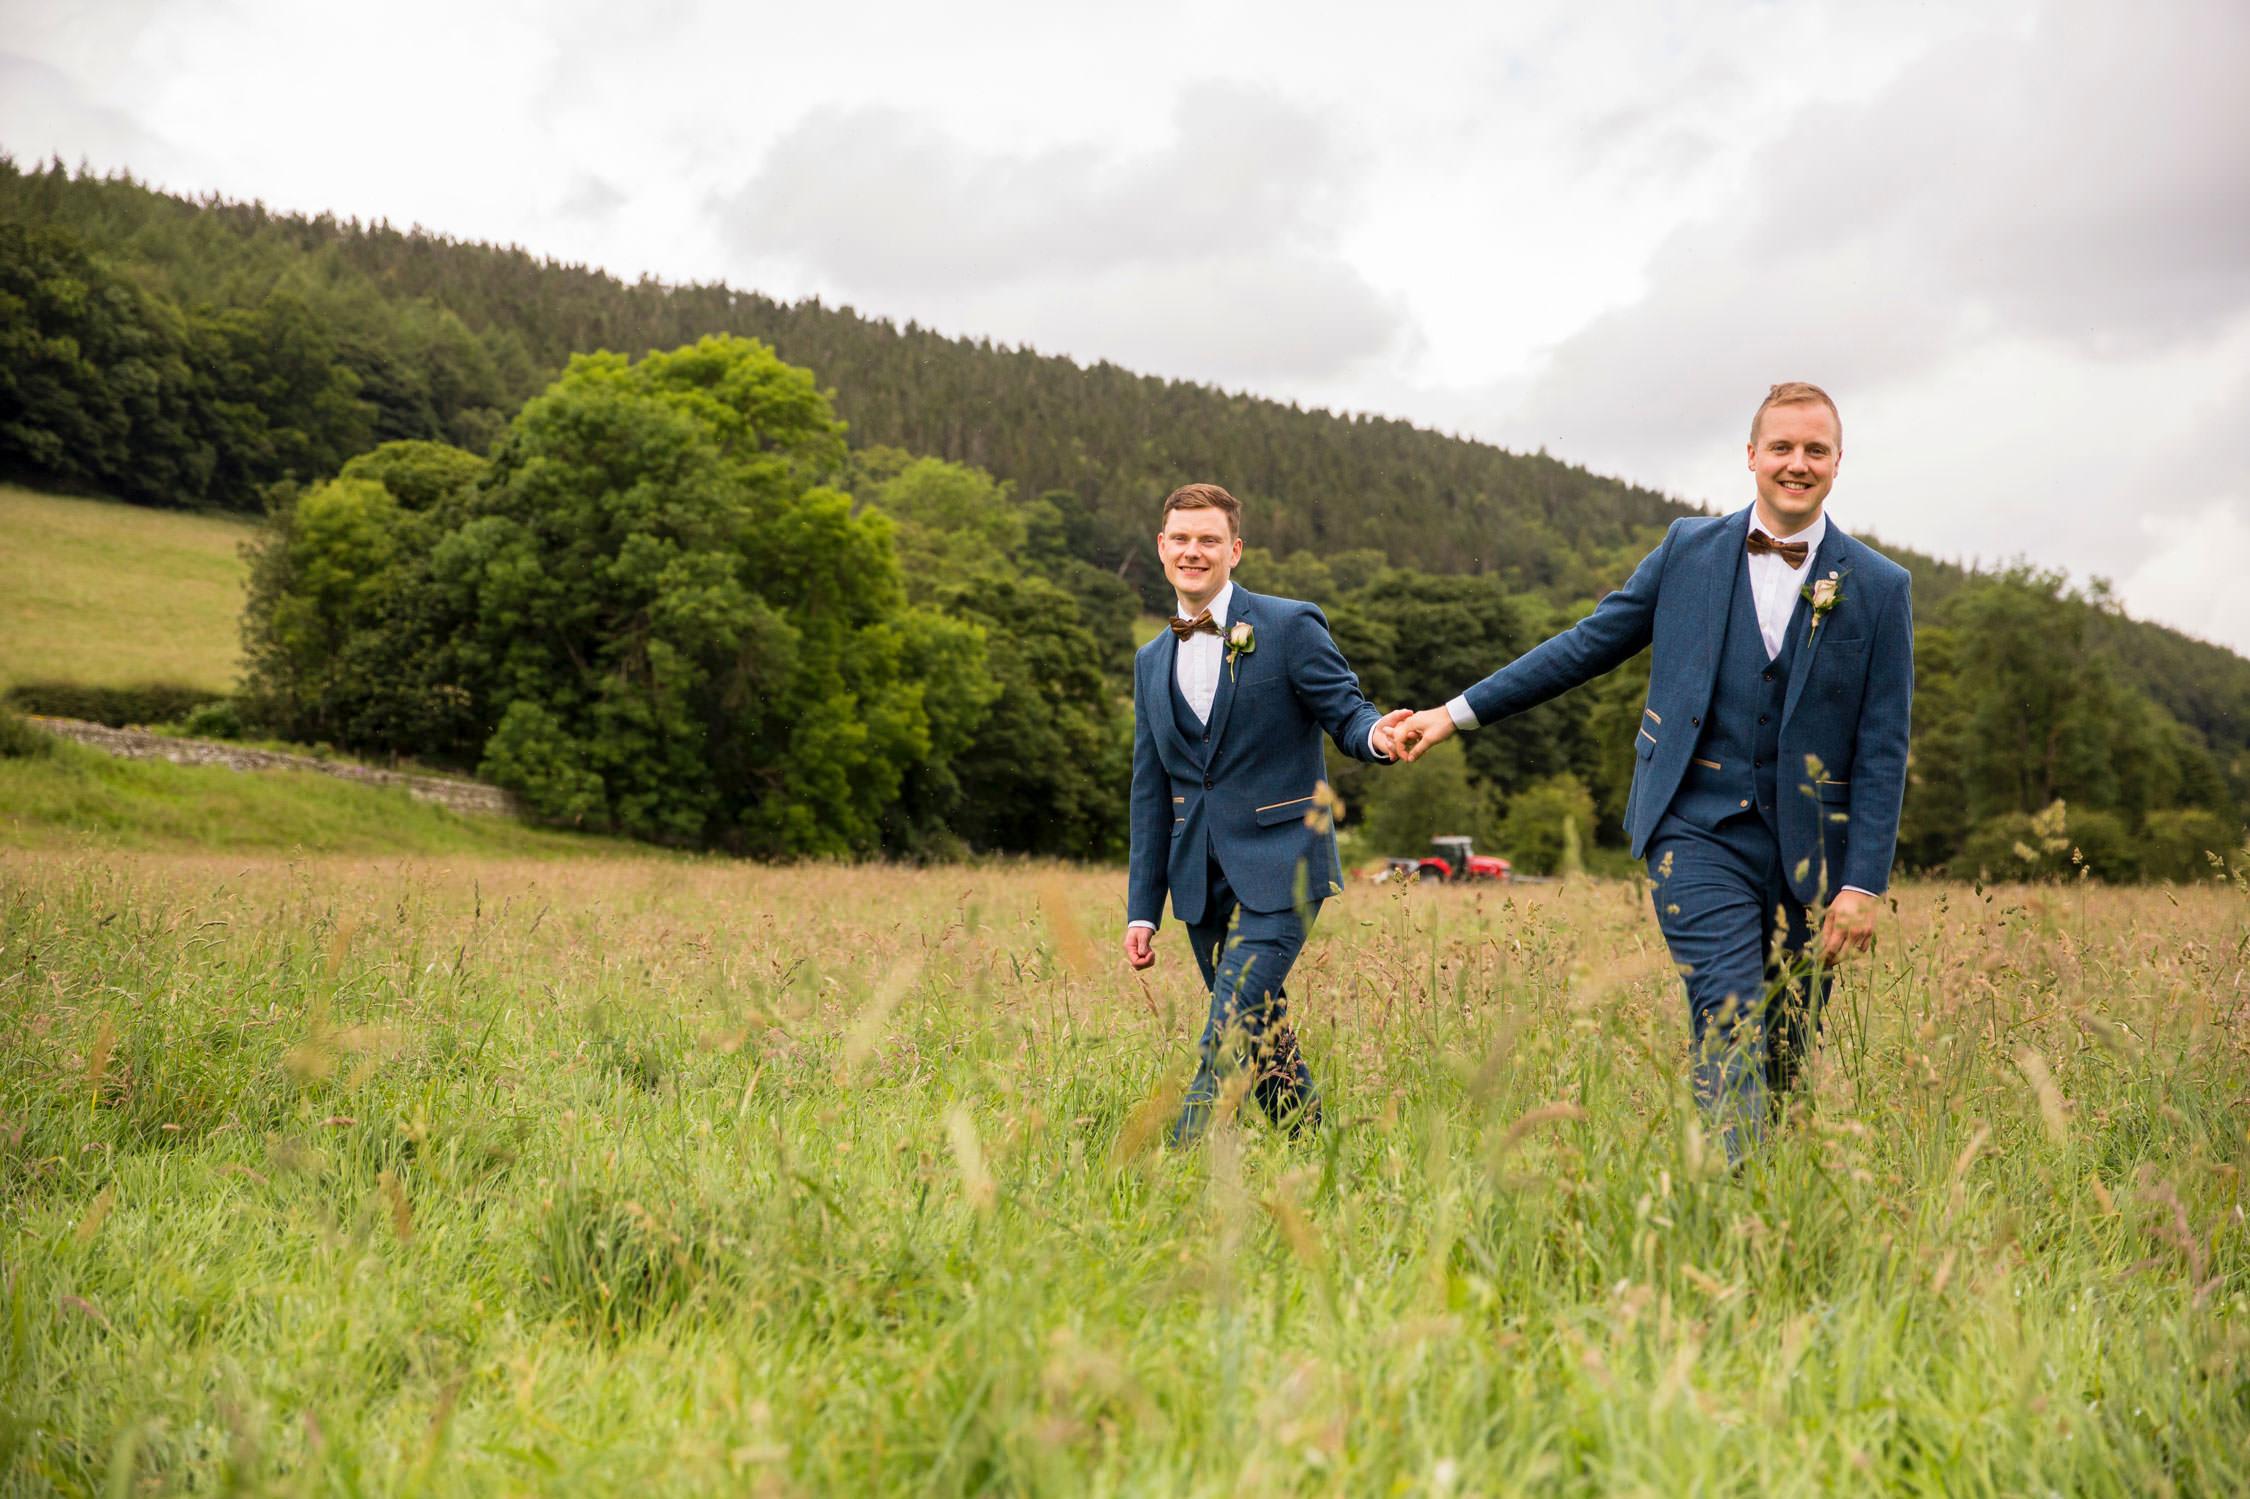 Lord Crewe Arms Weddings